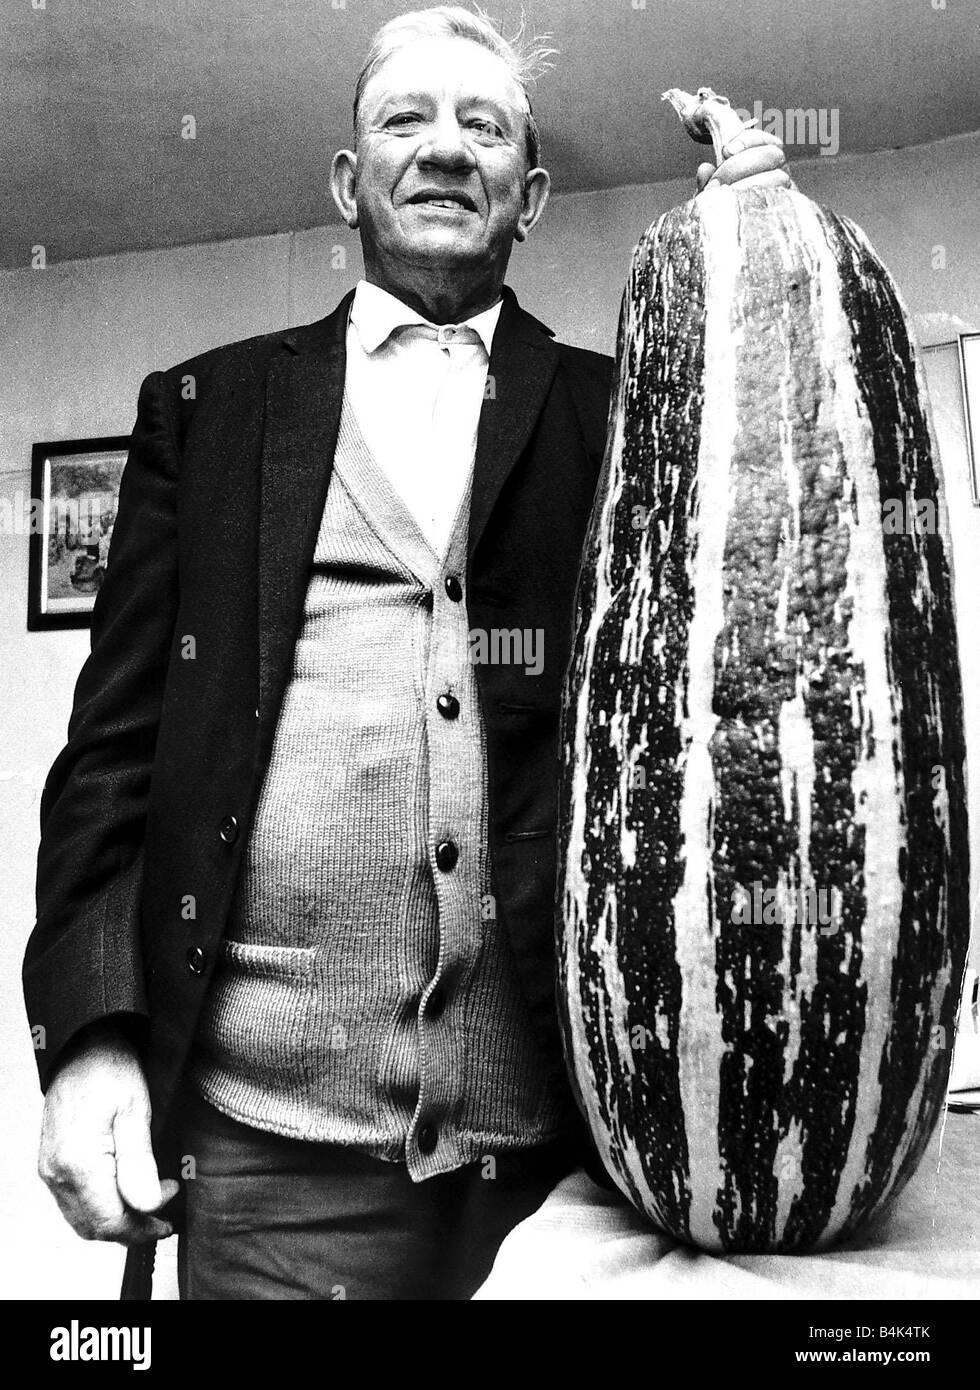 Giant marrow Vegetables marrow circa 1987 - Stock Image